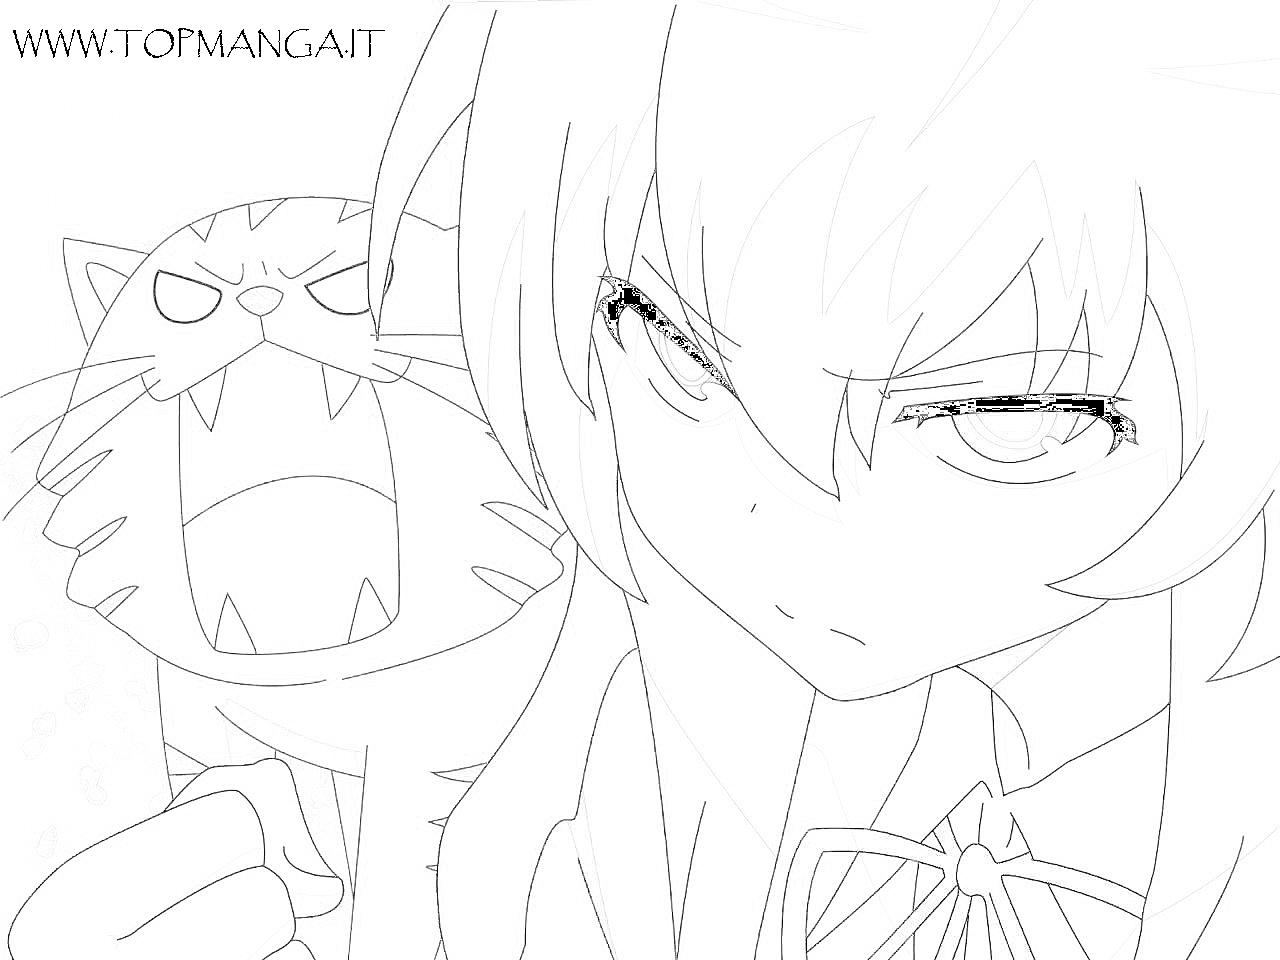 Immagini Da Colorare Di Toradora Topmanga Anime E